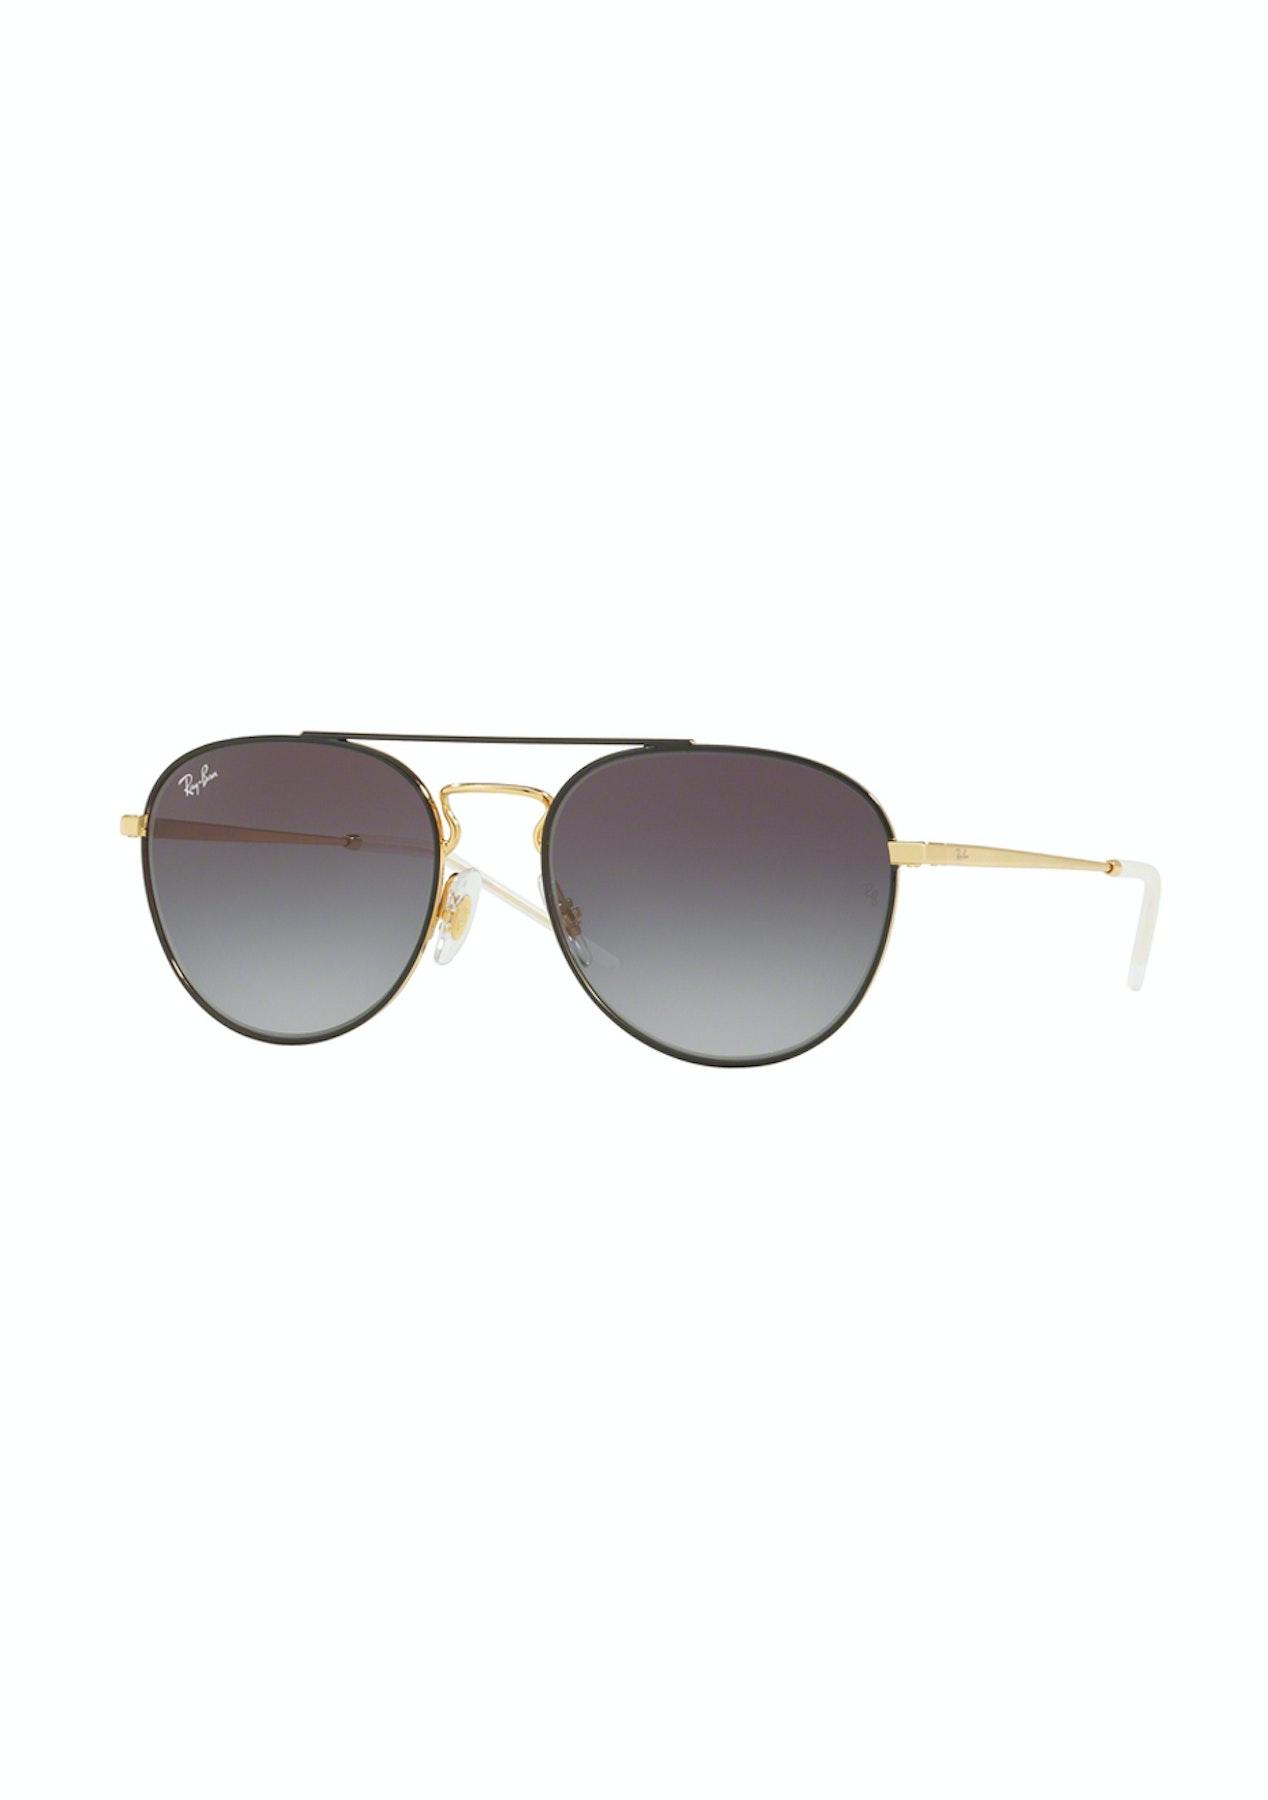 e9d5298d6943 Ray-Ban Highstreet Black Gold/Grey Sunglasses - Designer Eyewear Price Drop  - Onceit